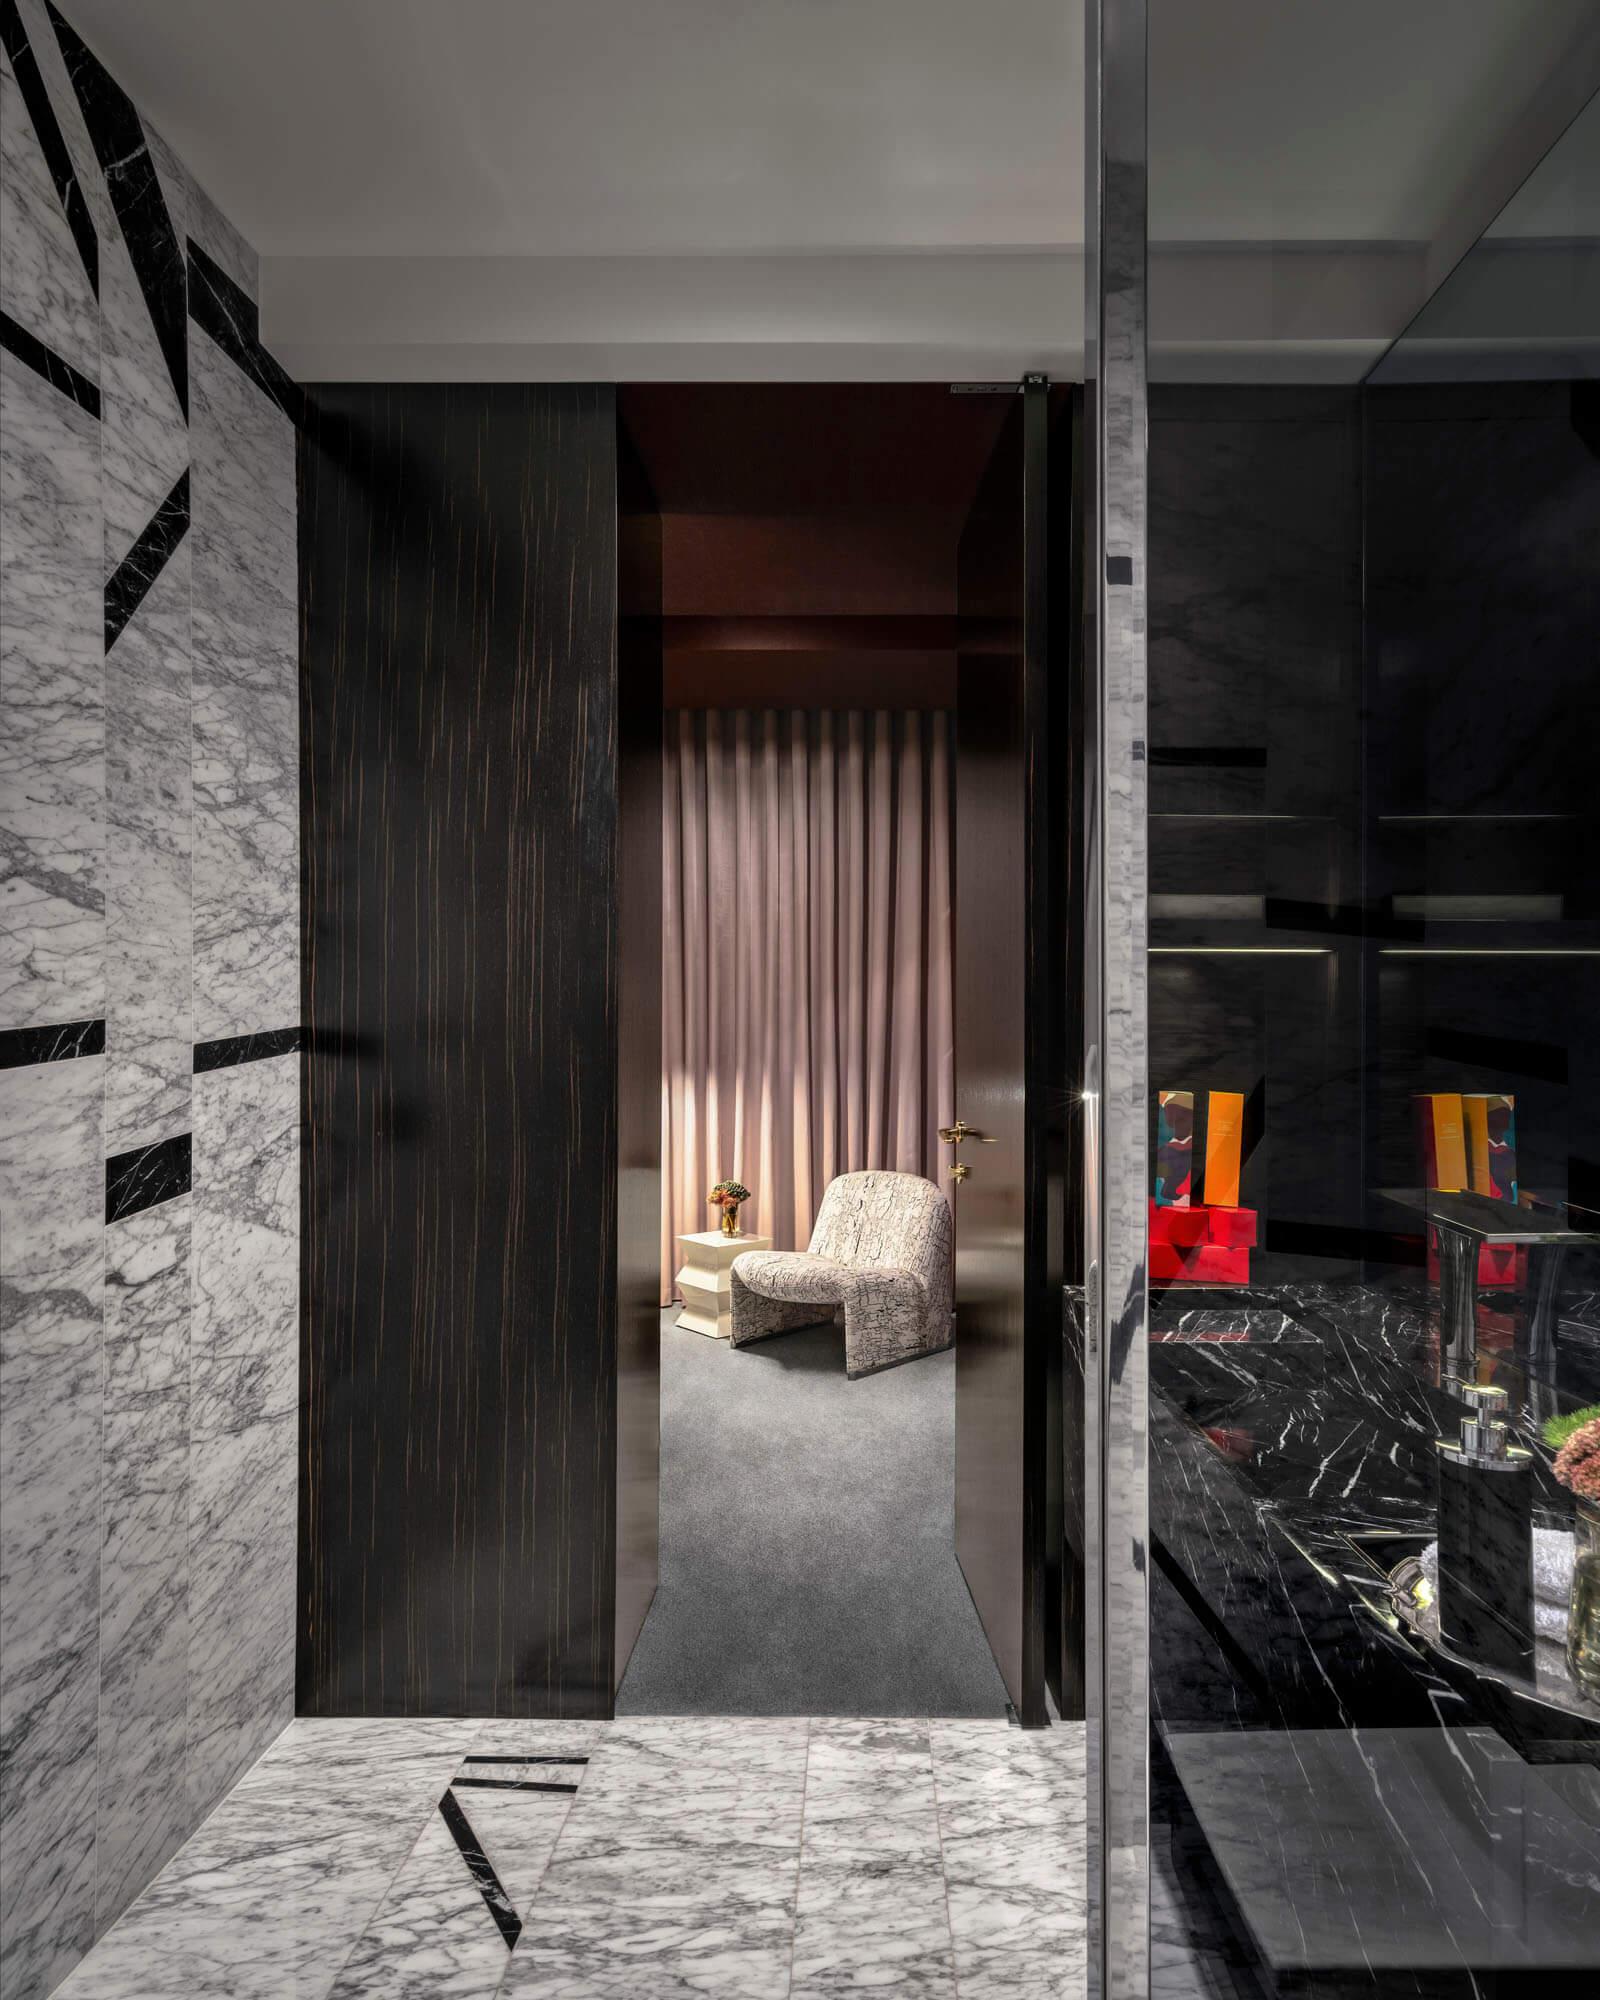 Gavinho Architecture & Interiors